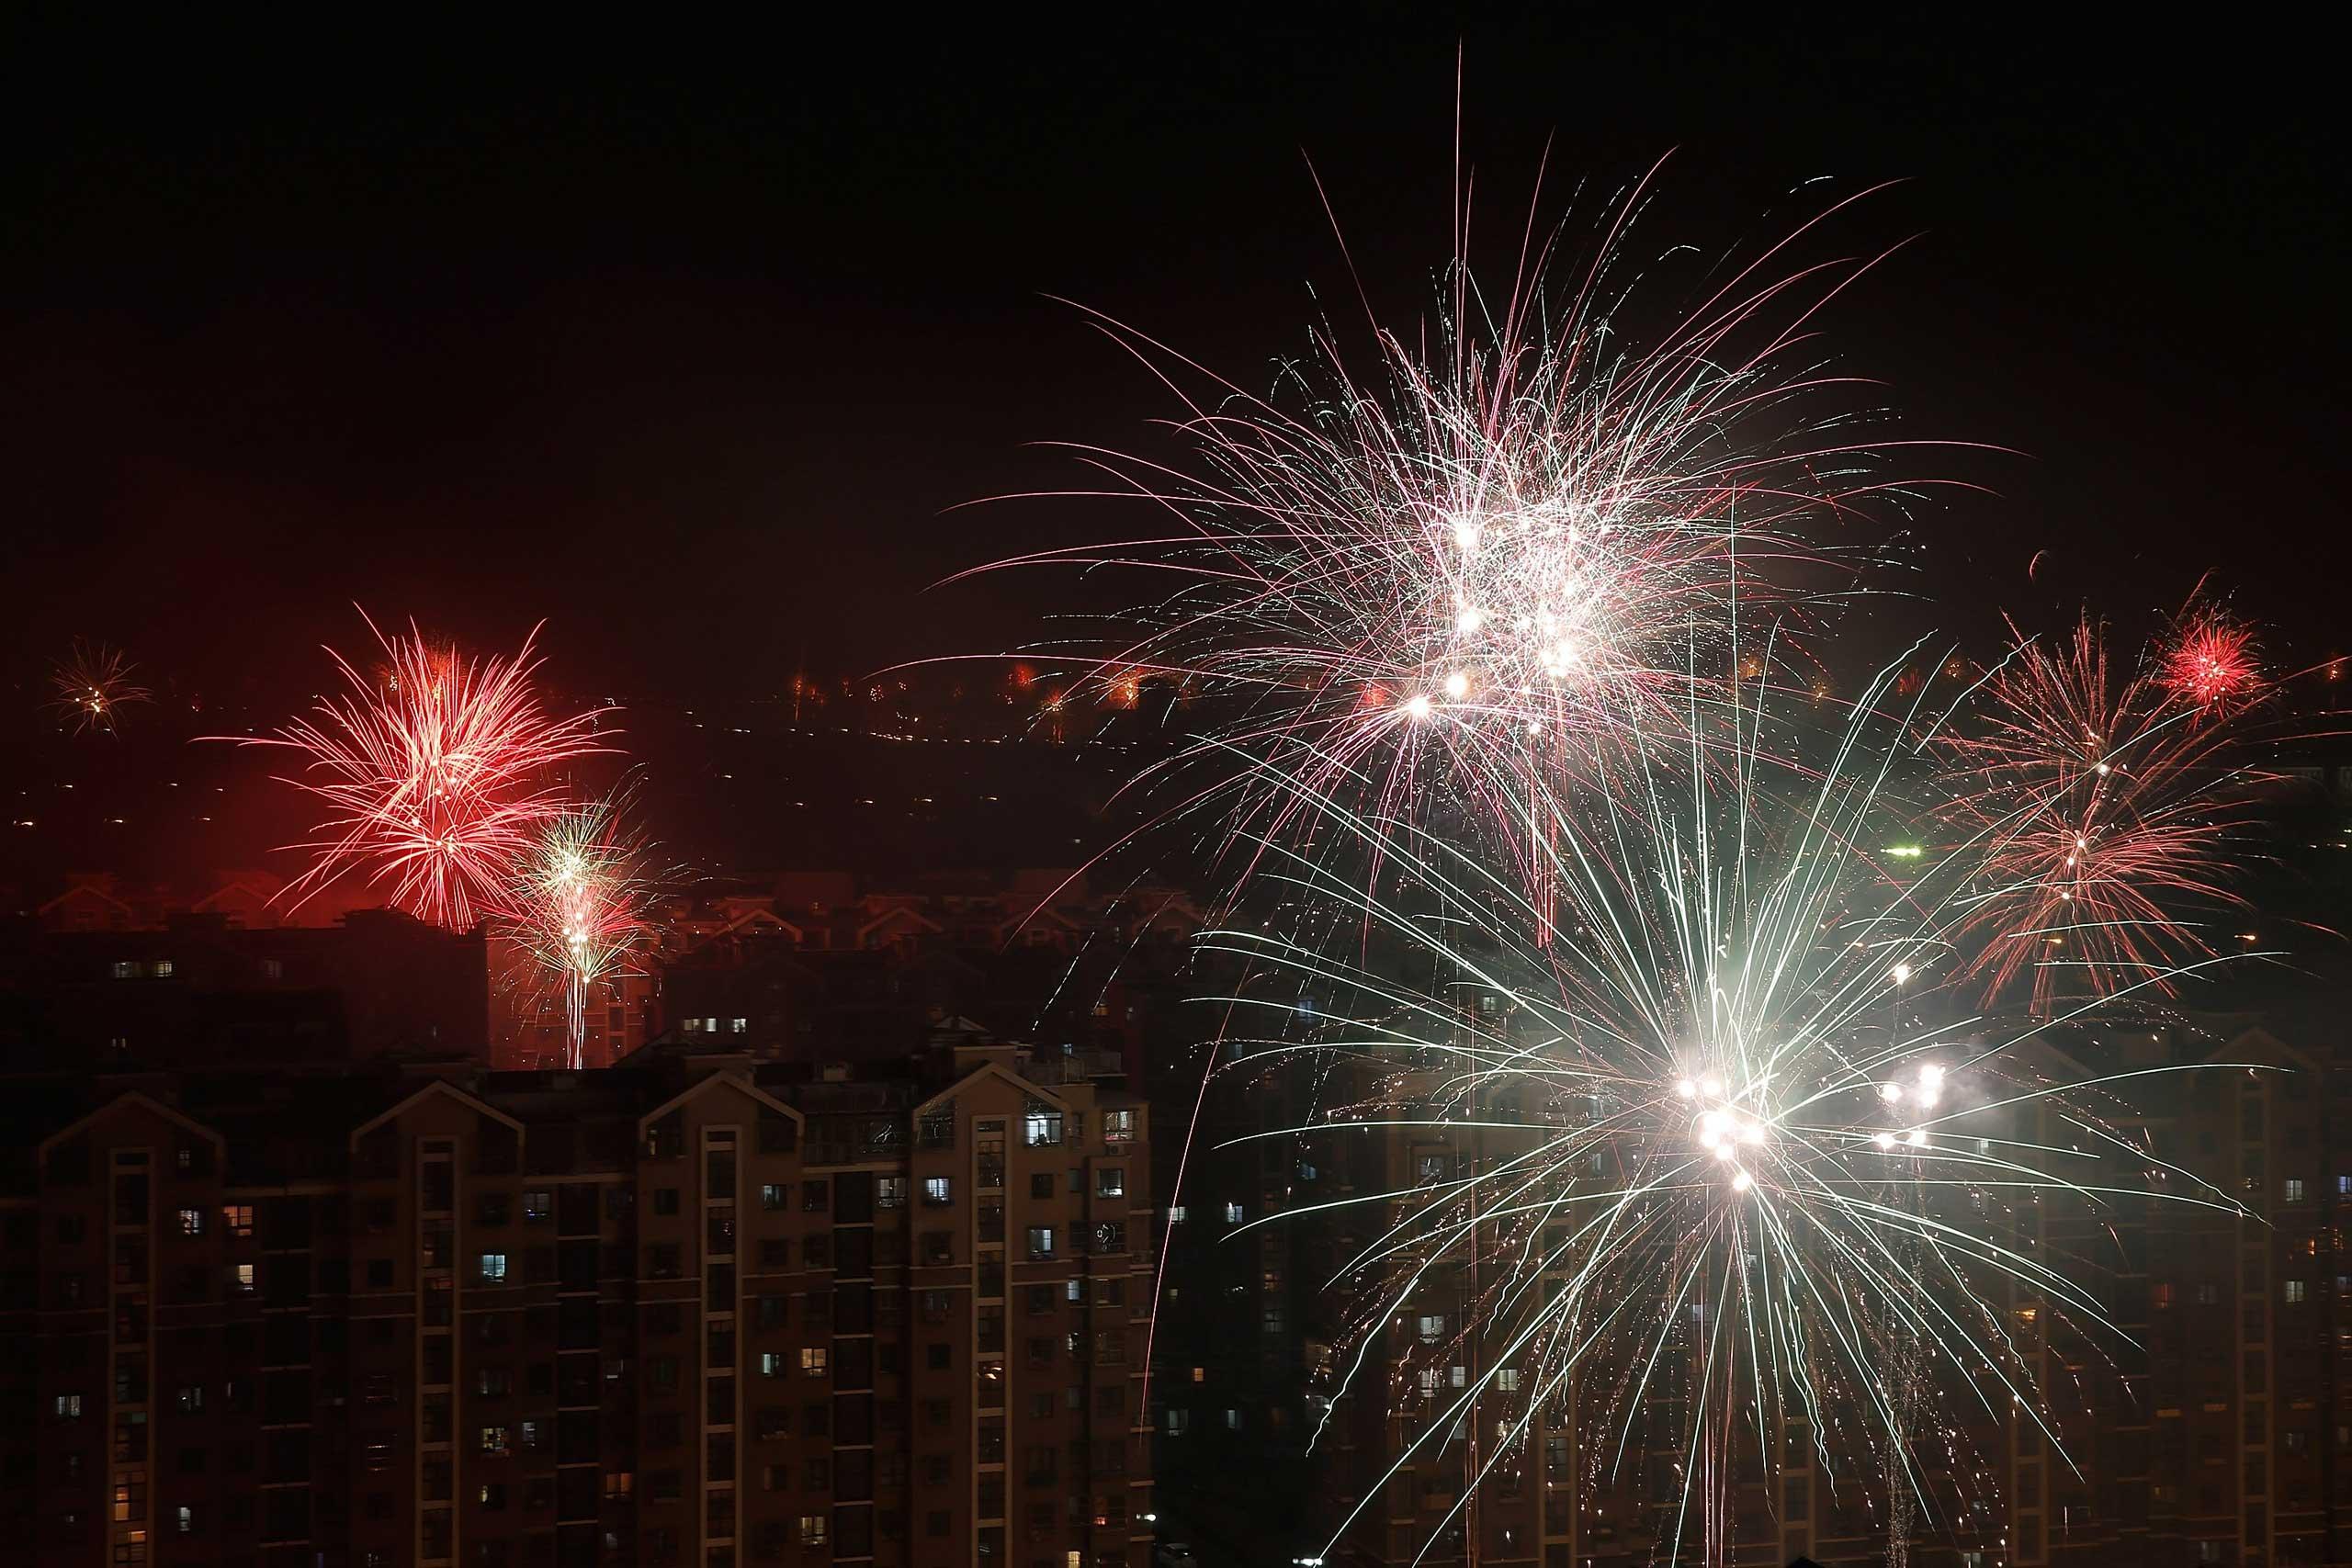 Fireworks illuminate the skyline to celebrate Lunar New Year on Feb. 18, 2015 in Beijing.